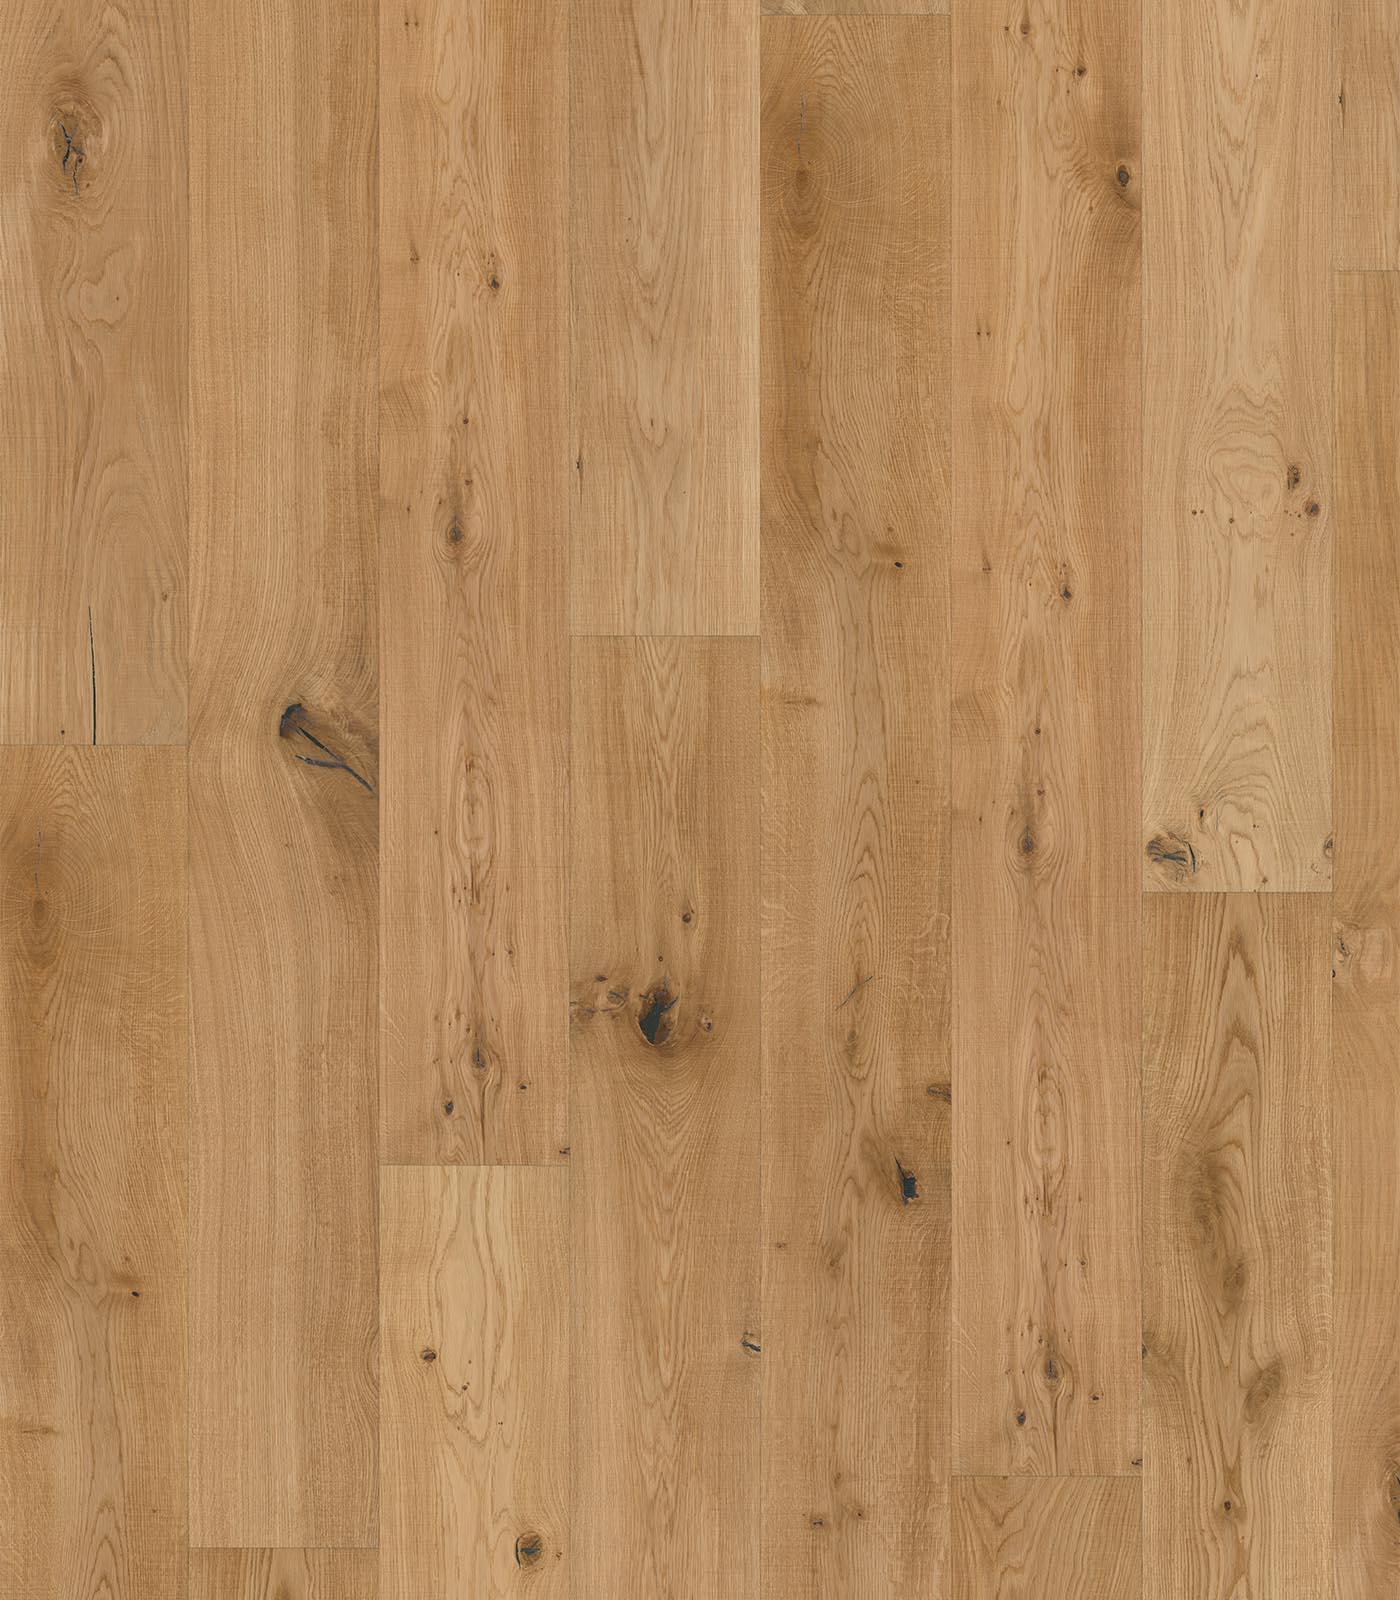 Taurus-Antique Collection-European Oak floors-flat